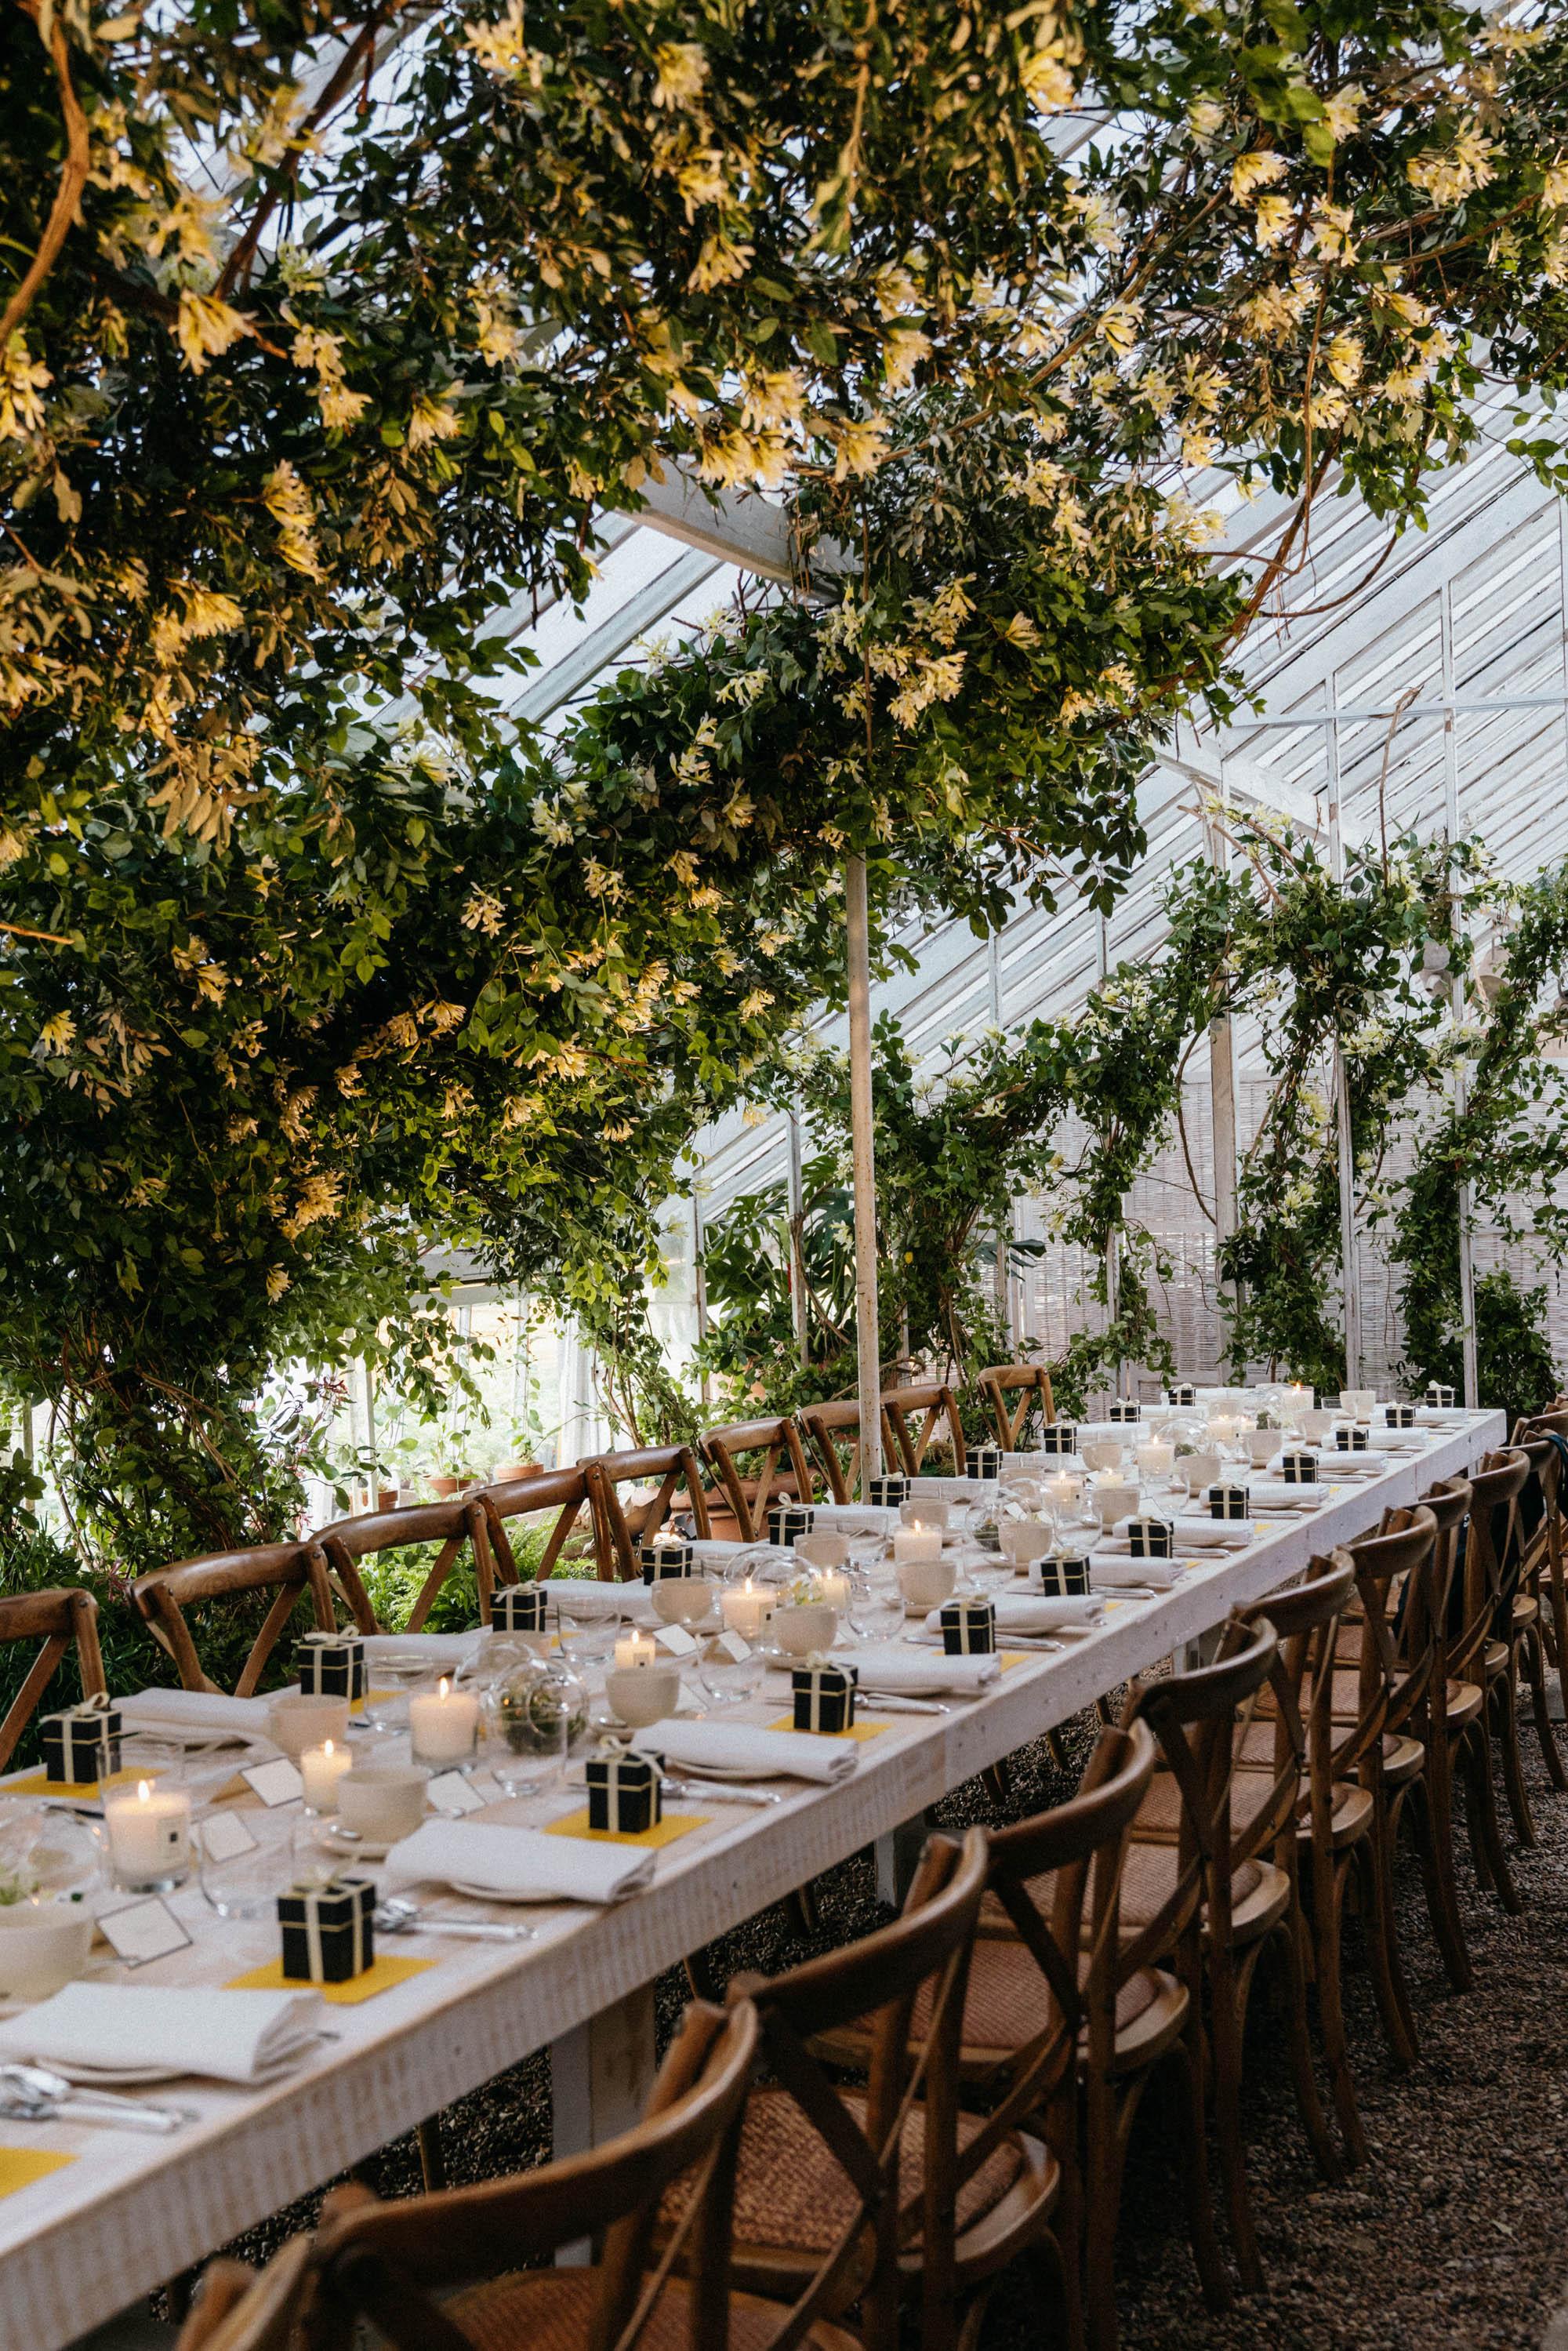 Beautiful lunch setting to celebrate Jo Malone London's Honeysuckle and Davana